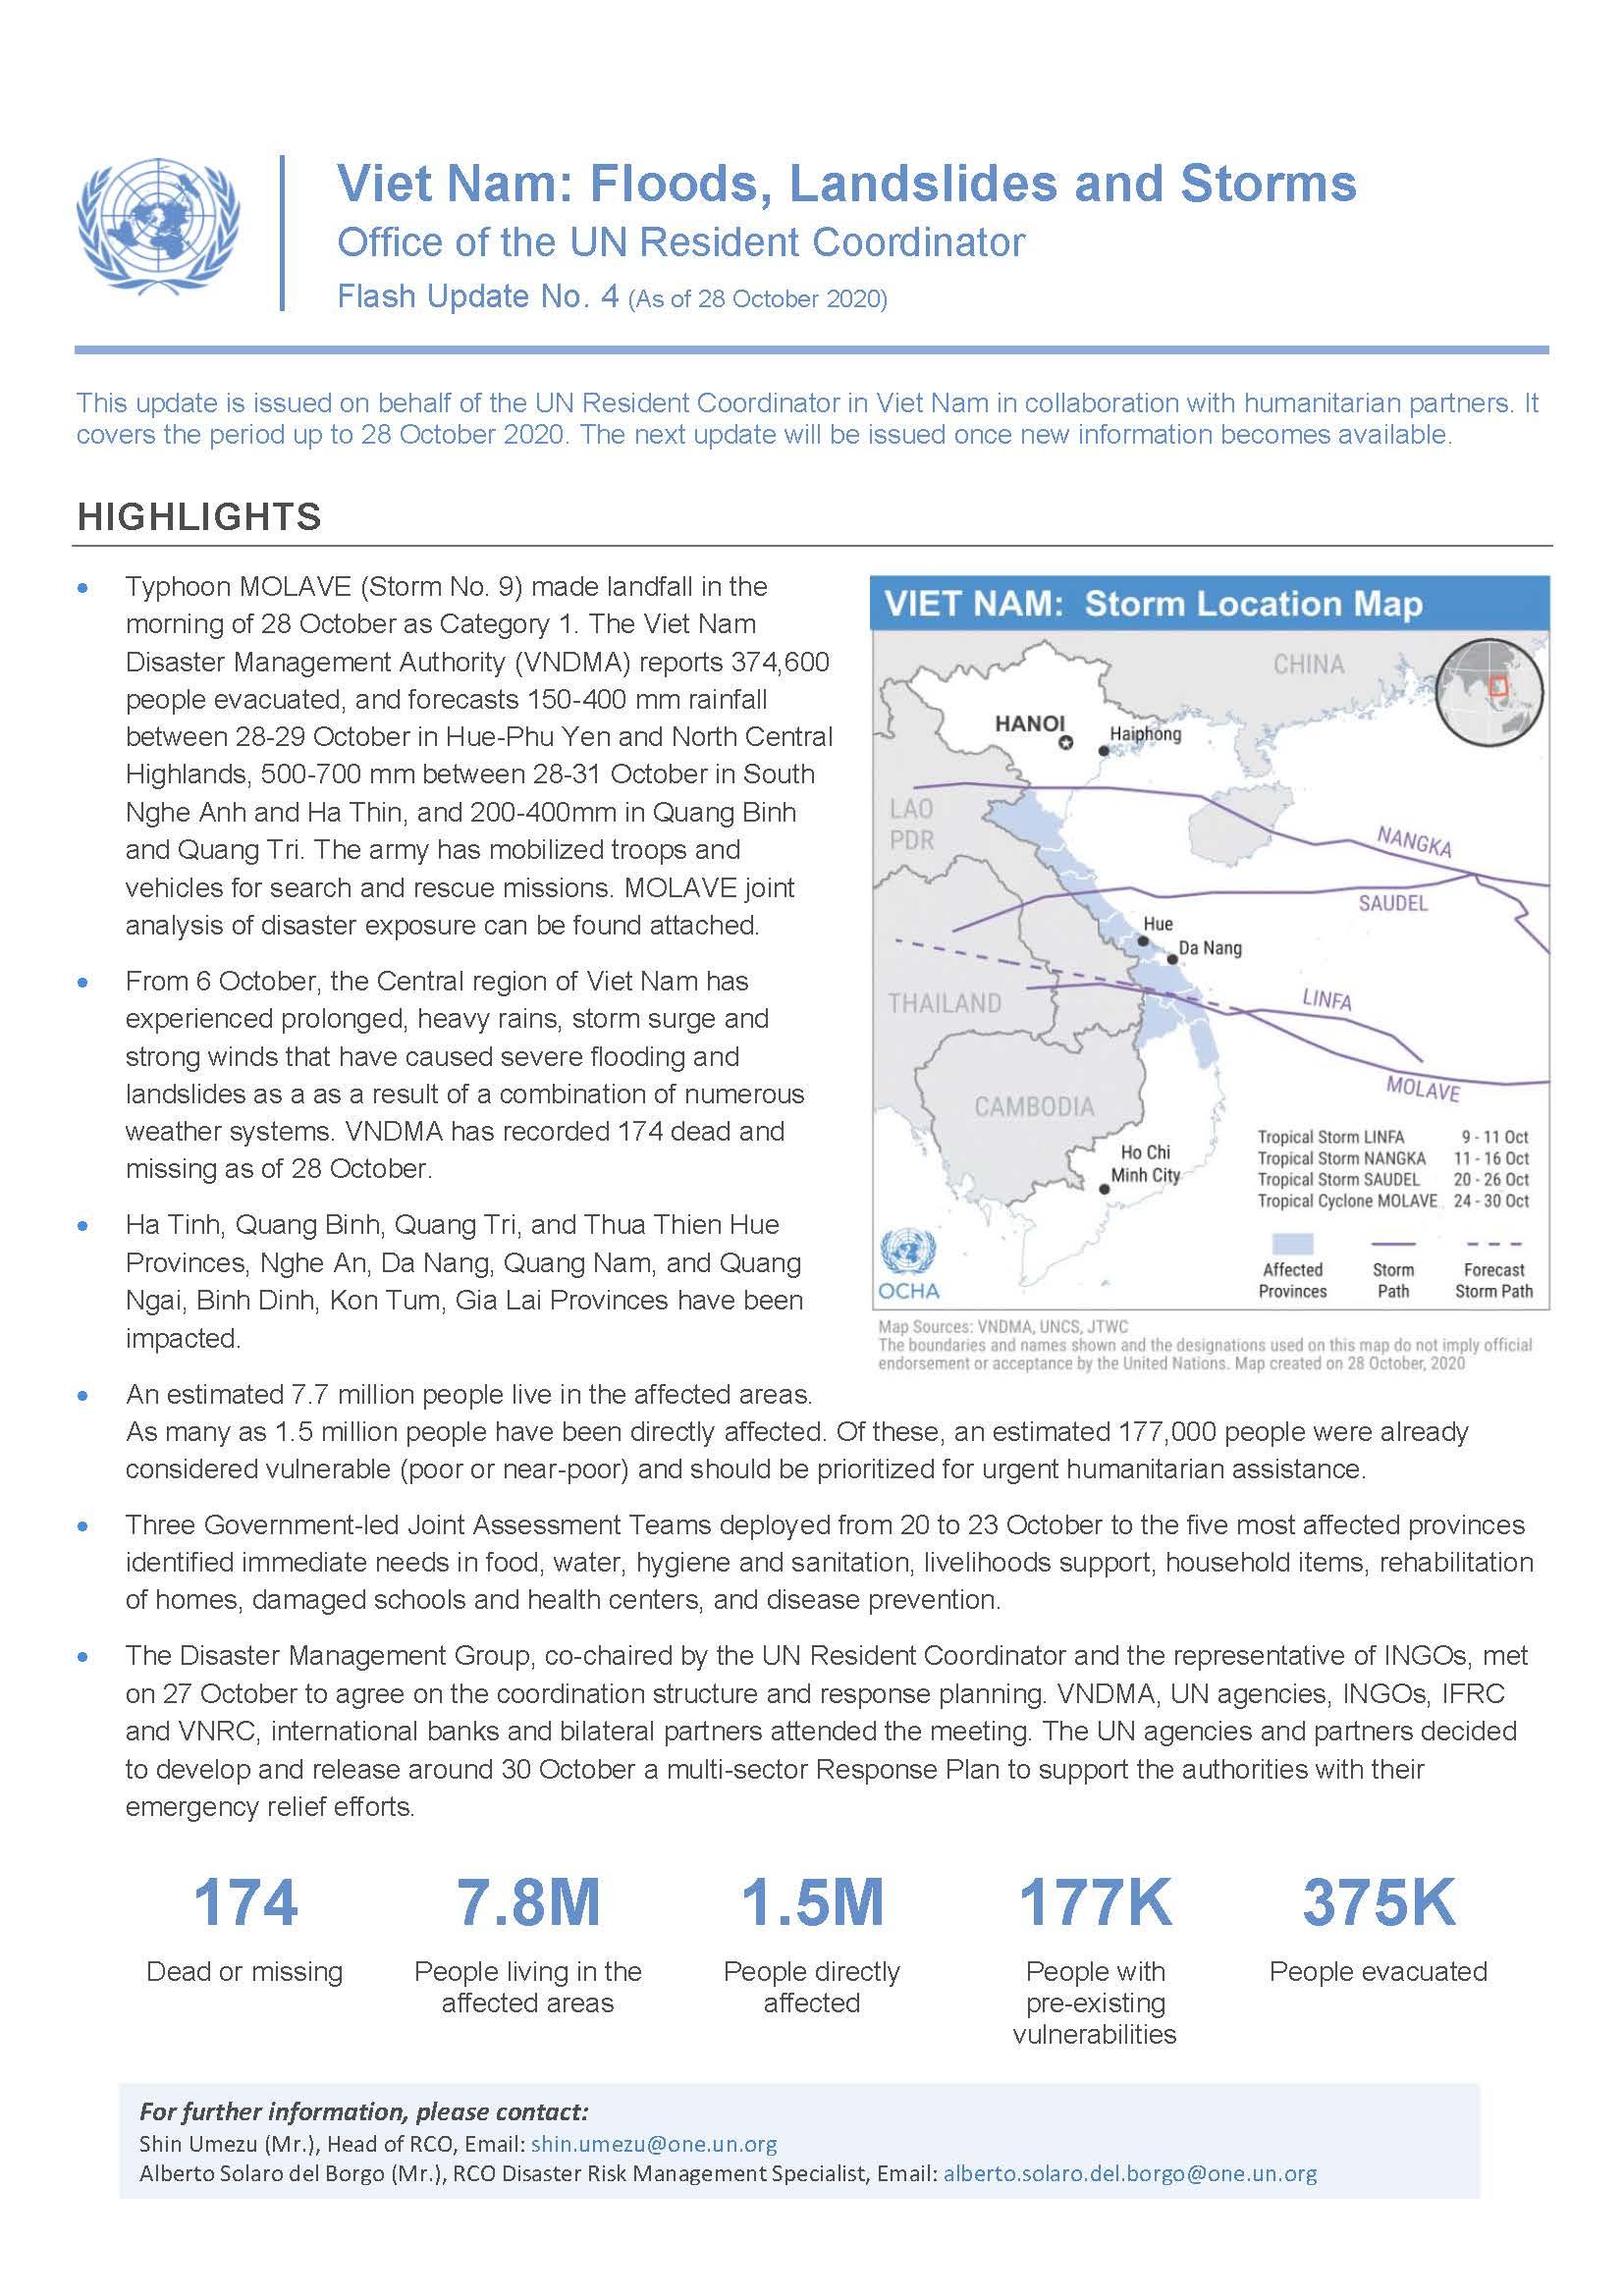 Viet Nam: Floods, Landslides and Storms Flash Update No. 4 (As of 28 October 2020)